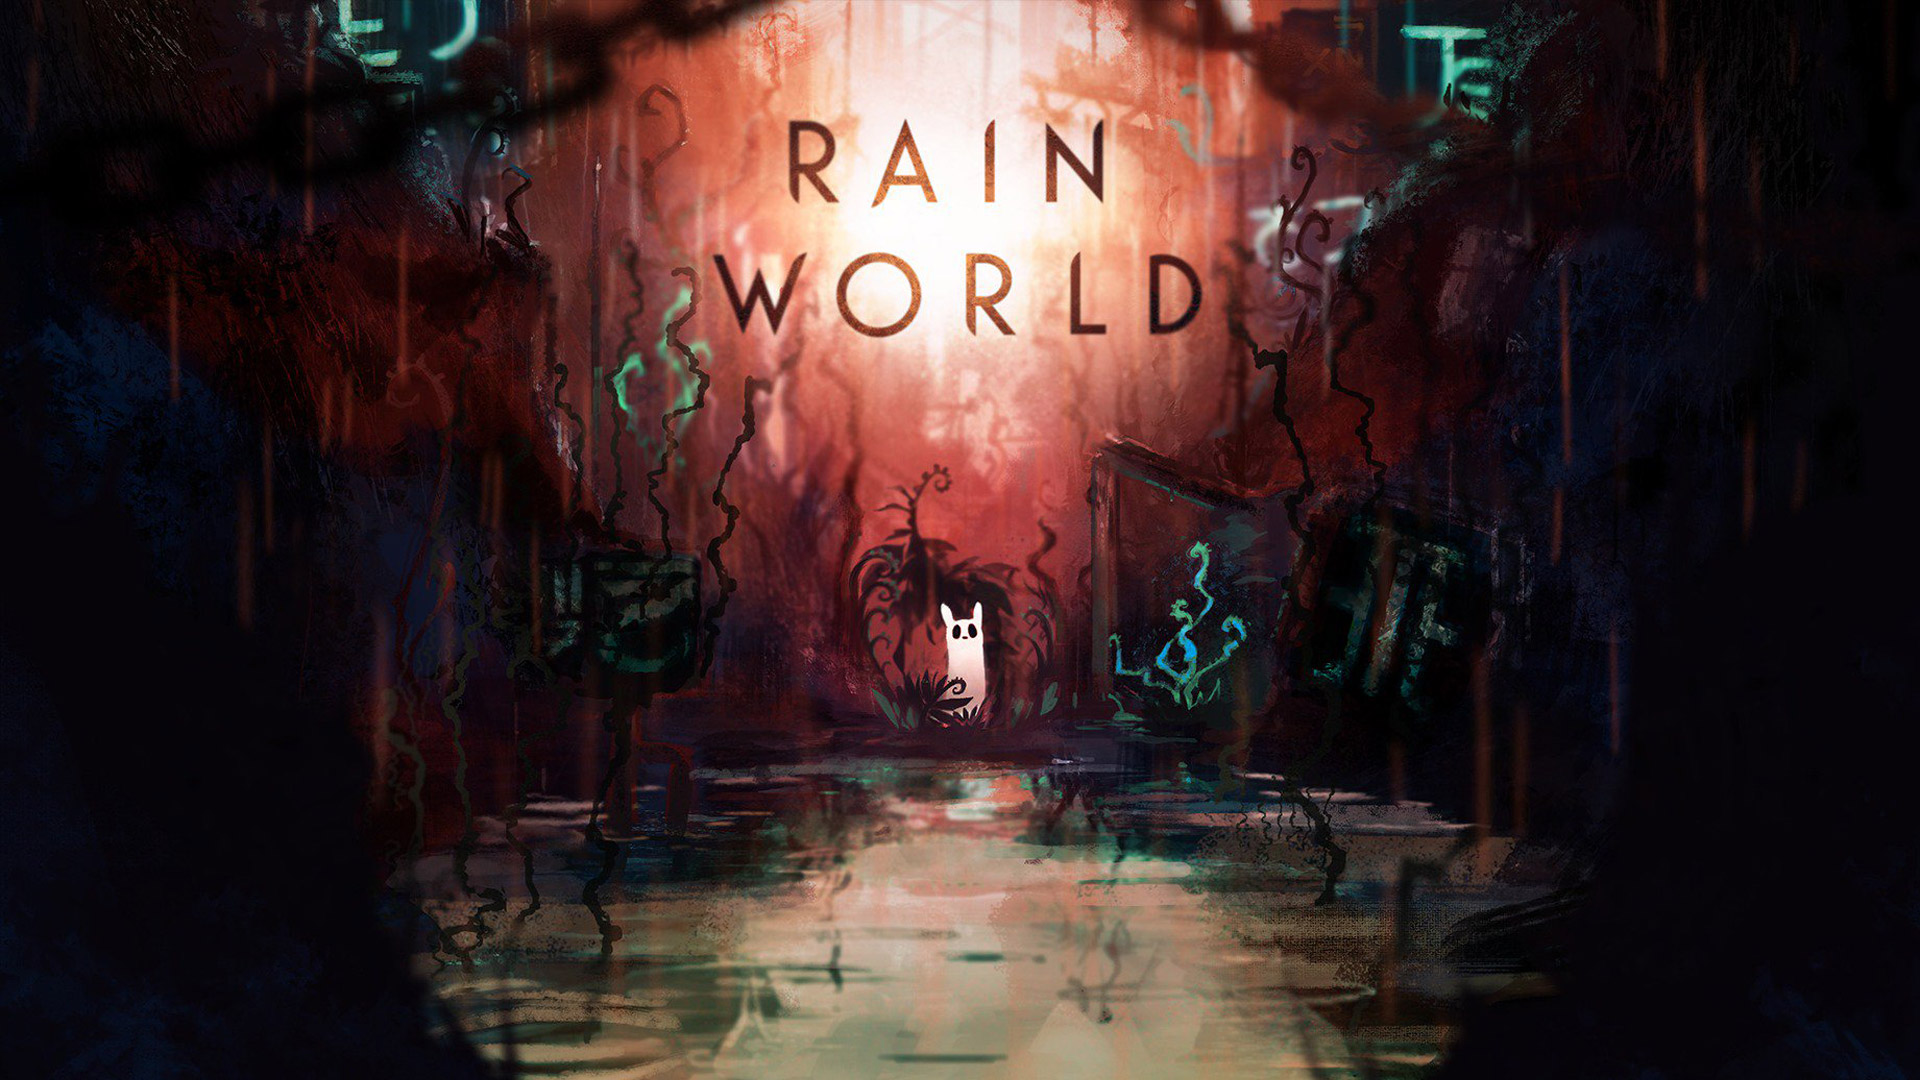 Free Rain World Wallpaper in 1920x1080